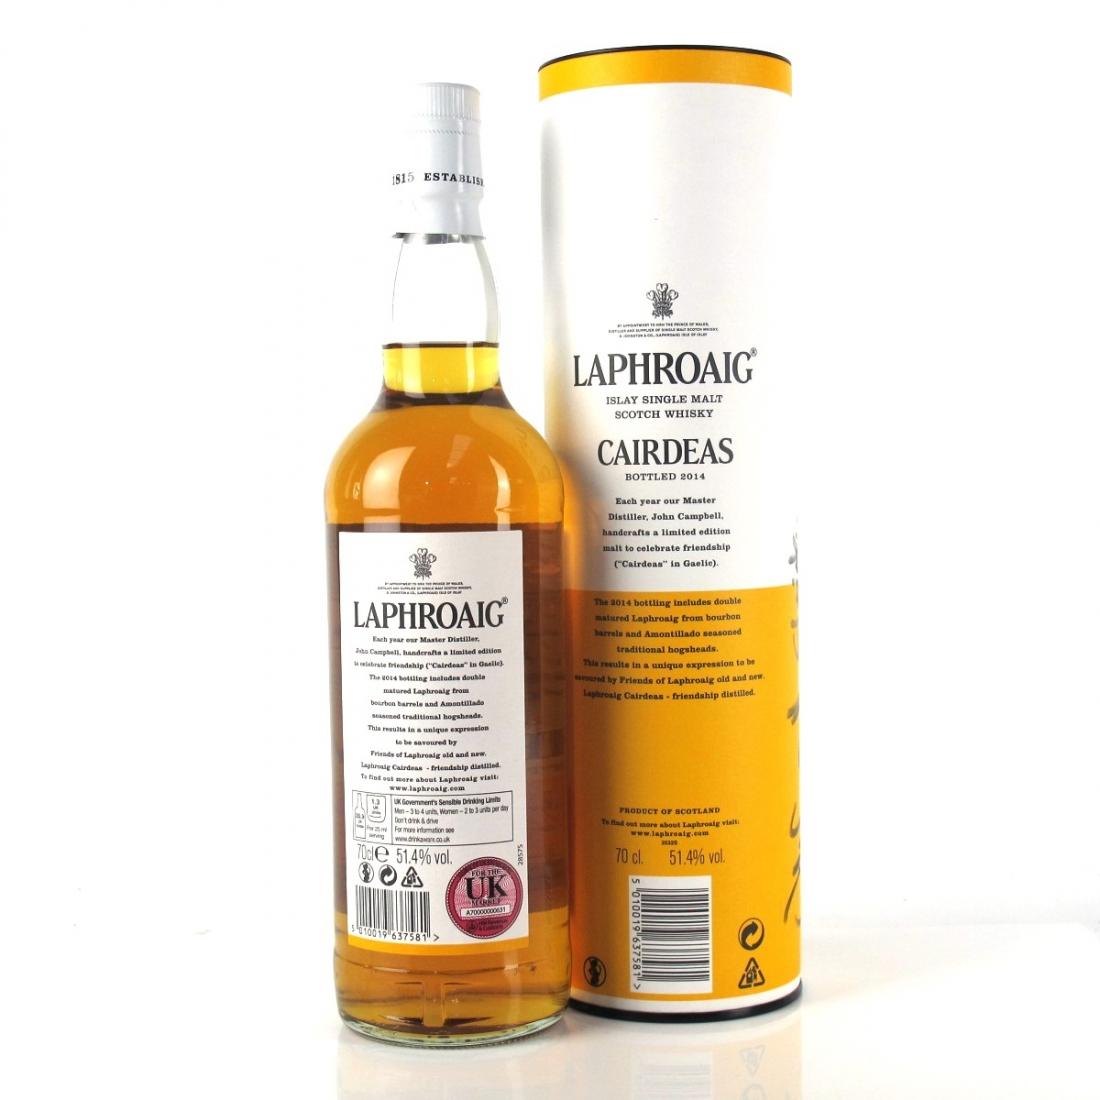 Laphroaig Cairdeas Amontillado Feis Ile 2014